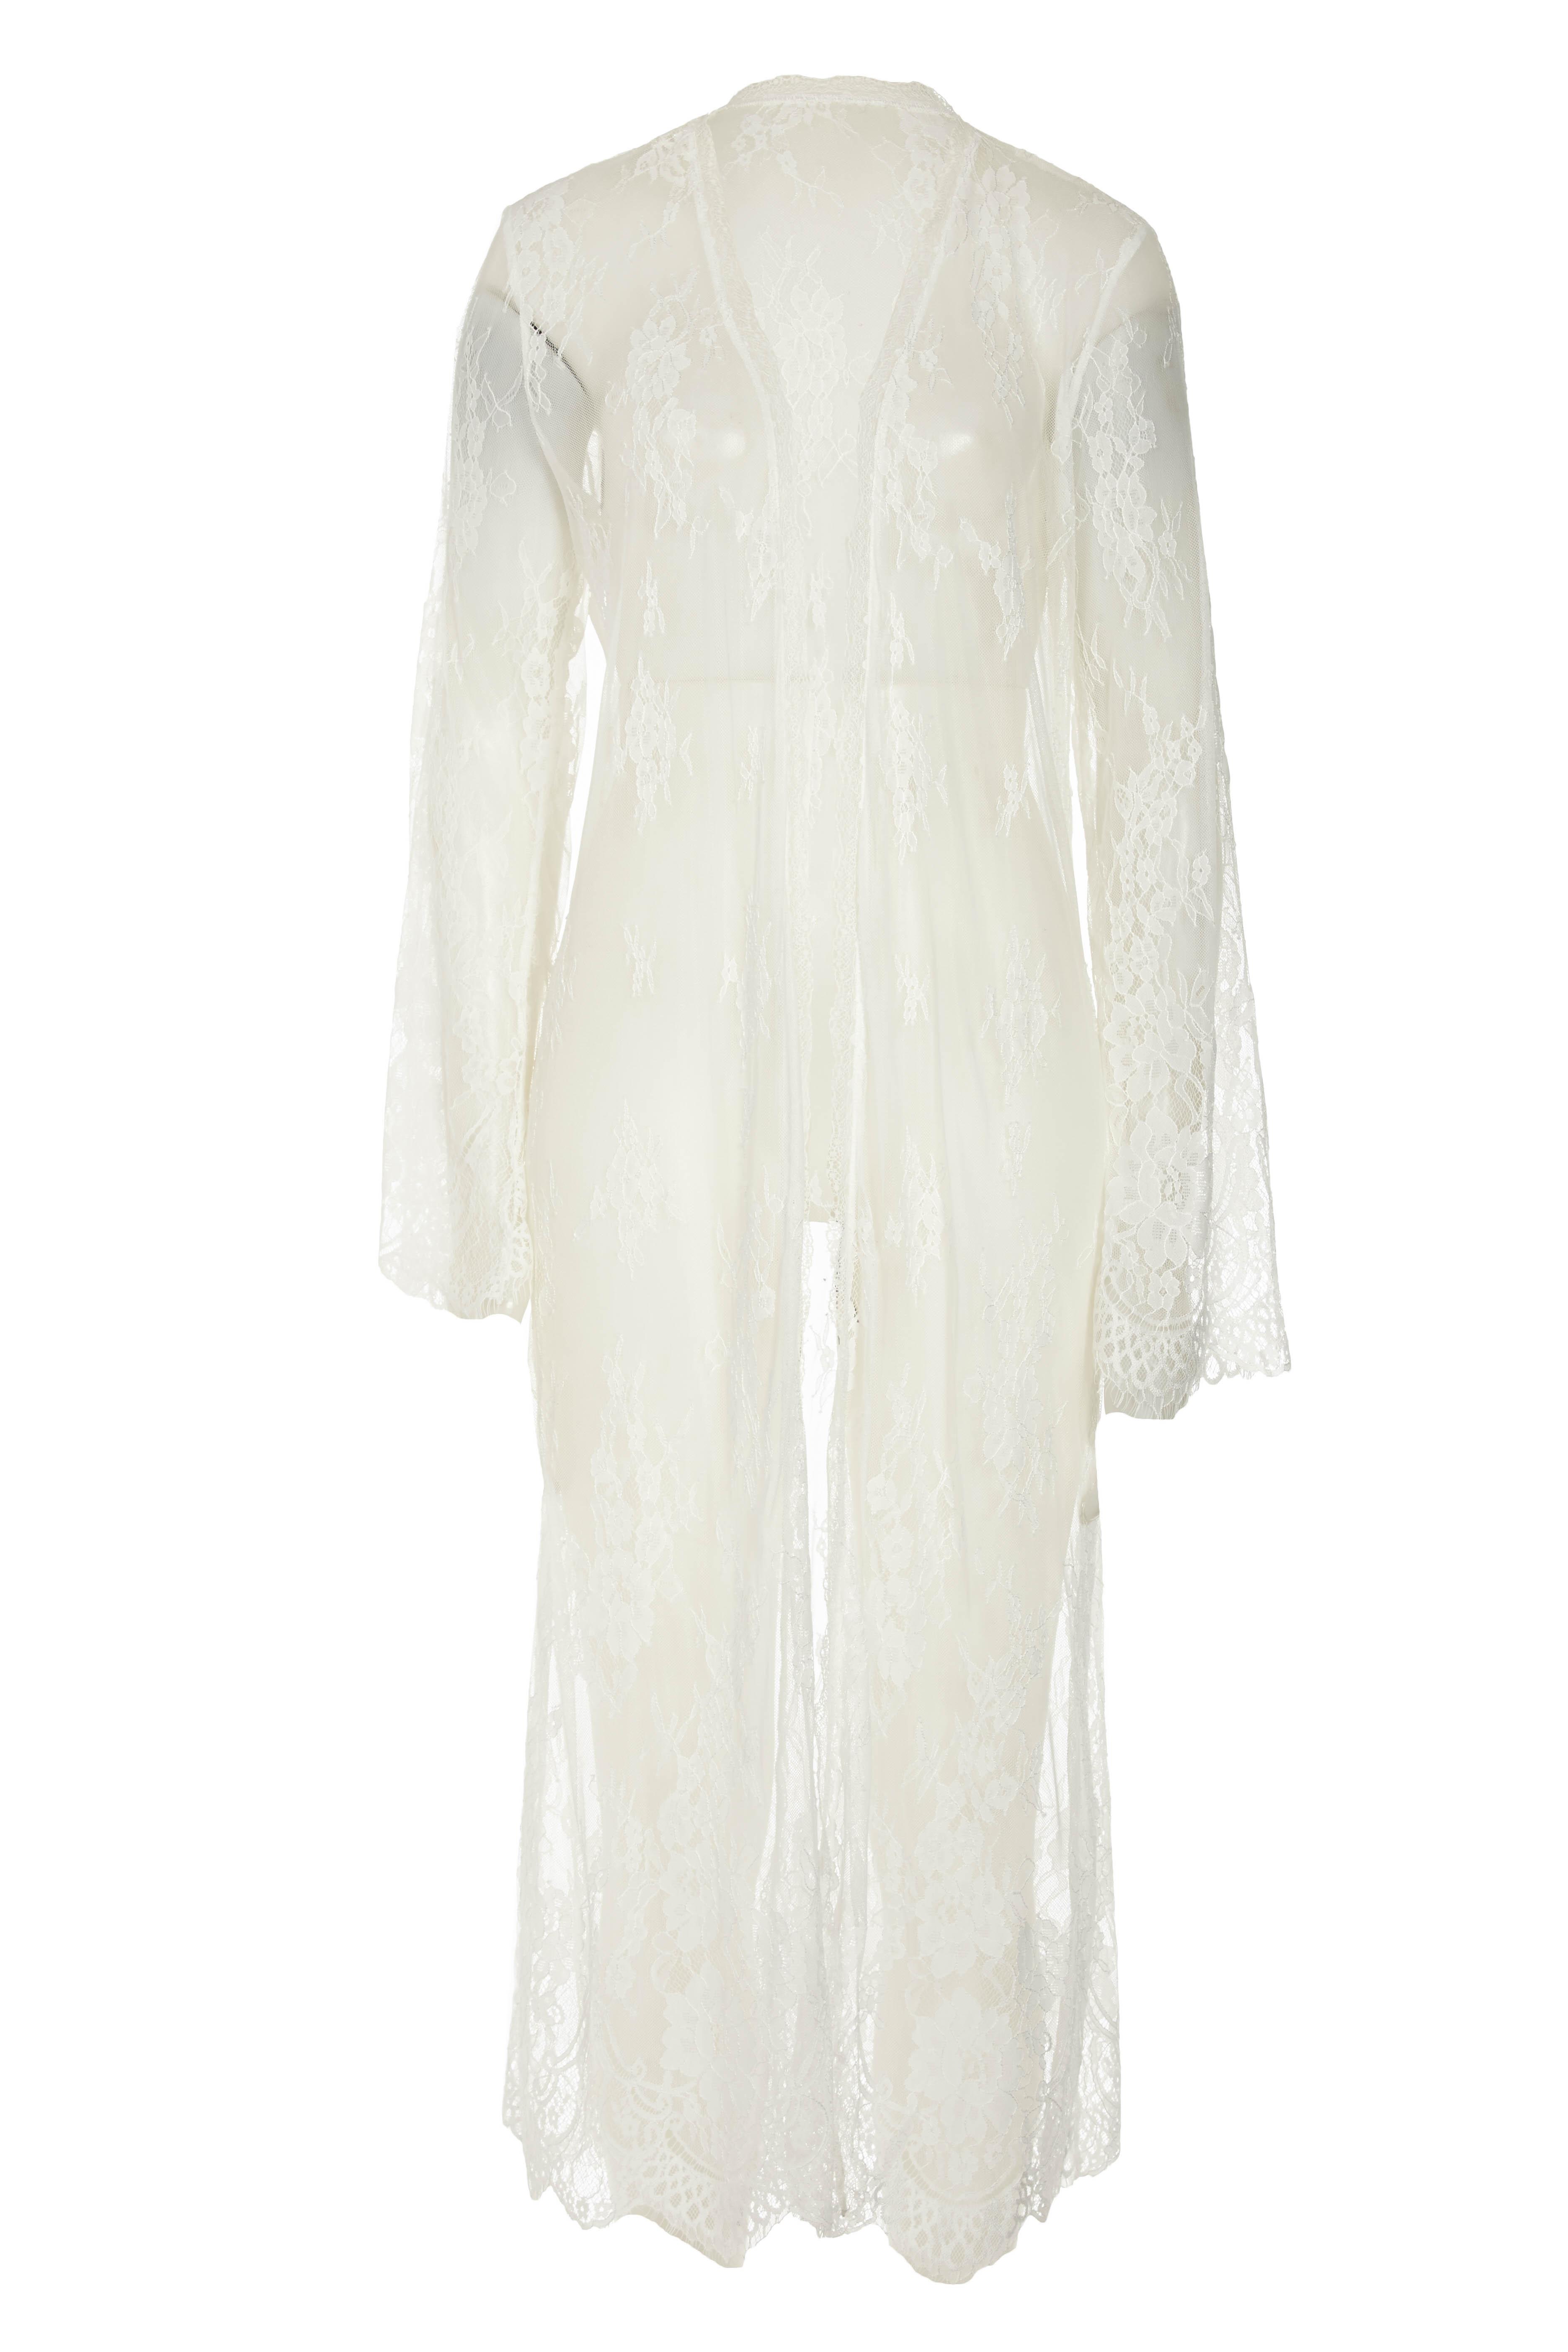 cotton-on-body_bridal-lace-kimono_nz59-95_sep-oct-nov-dec